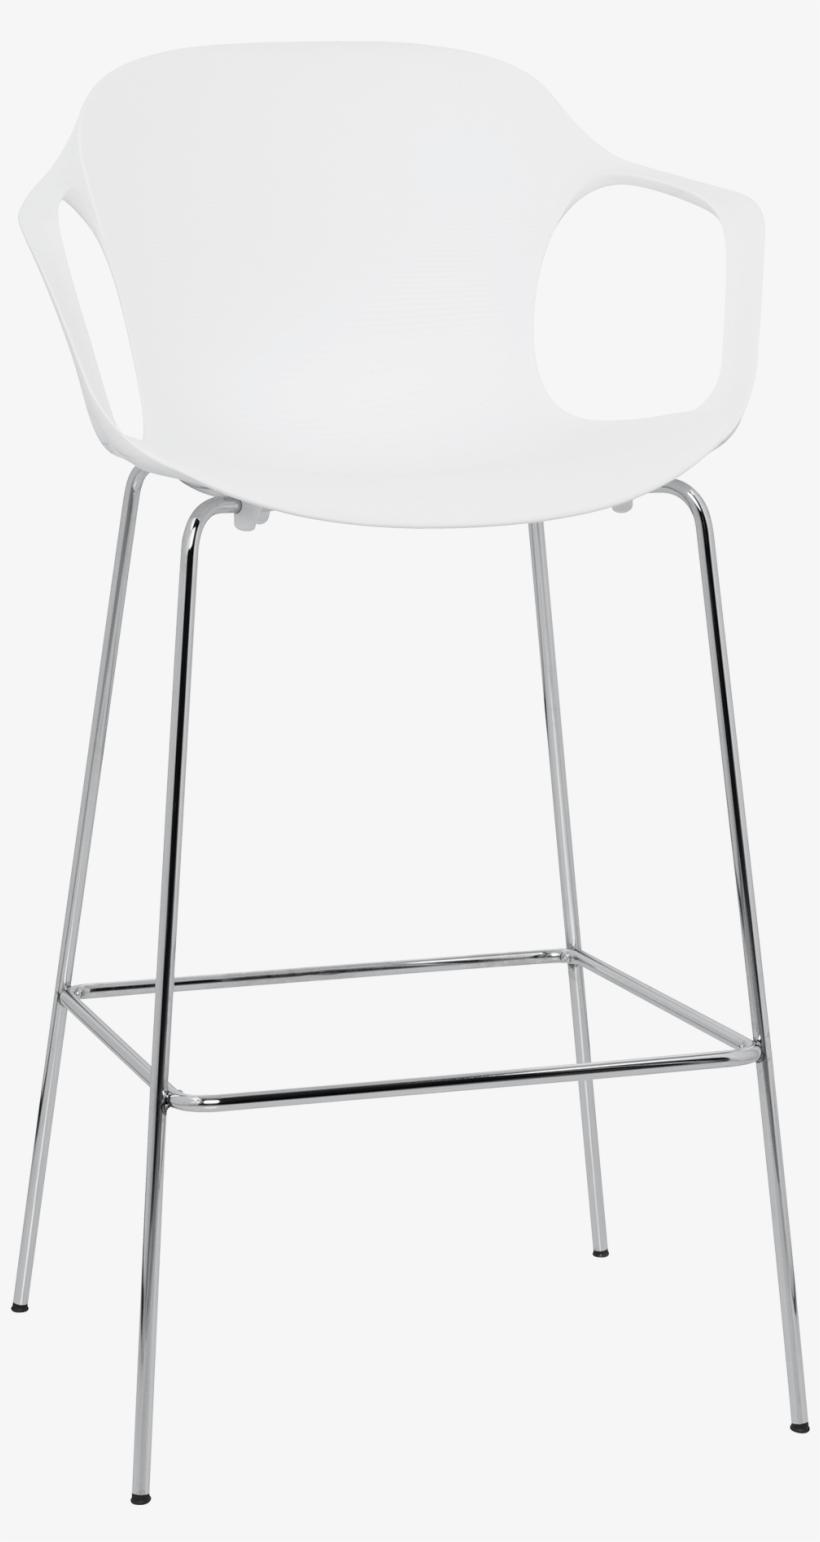 Nap Bar Stool Kasper Salto Milk White Chrome Steel - Chair, transparent png #8894472